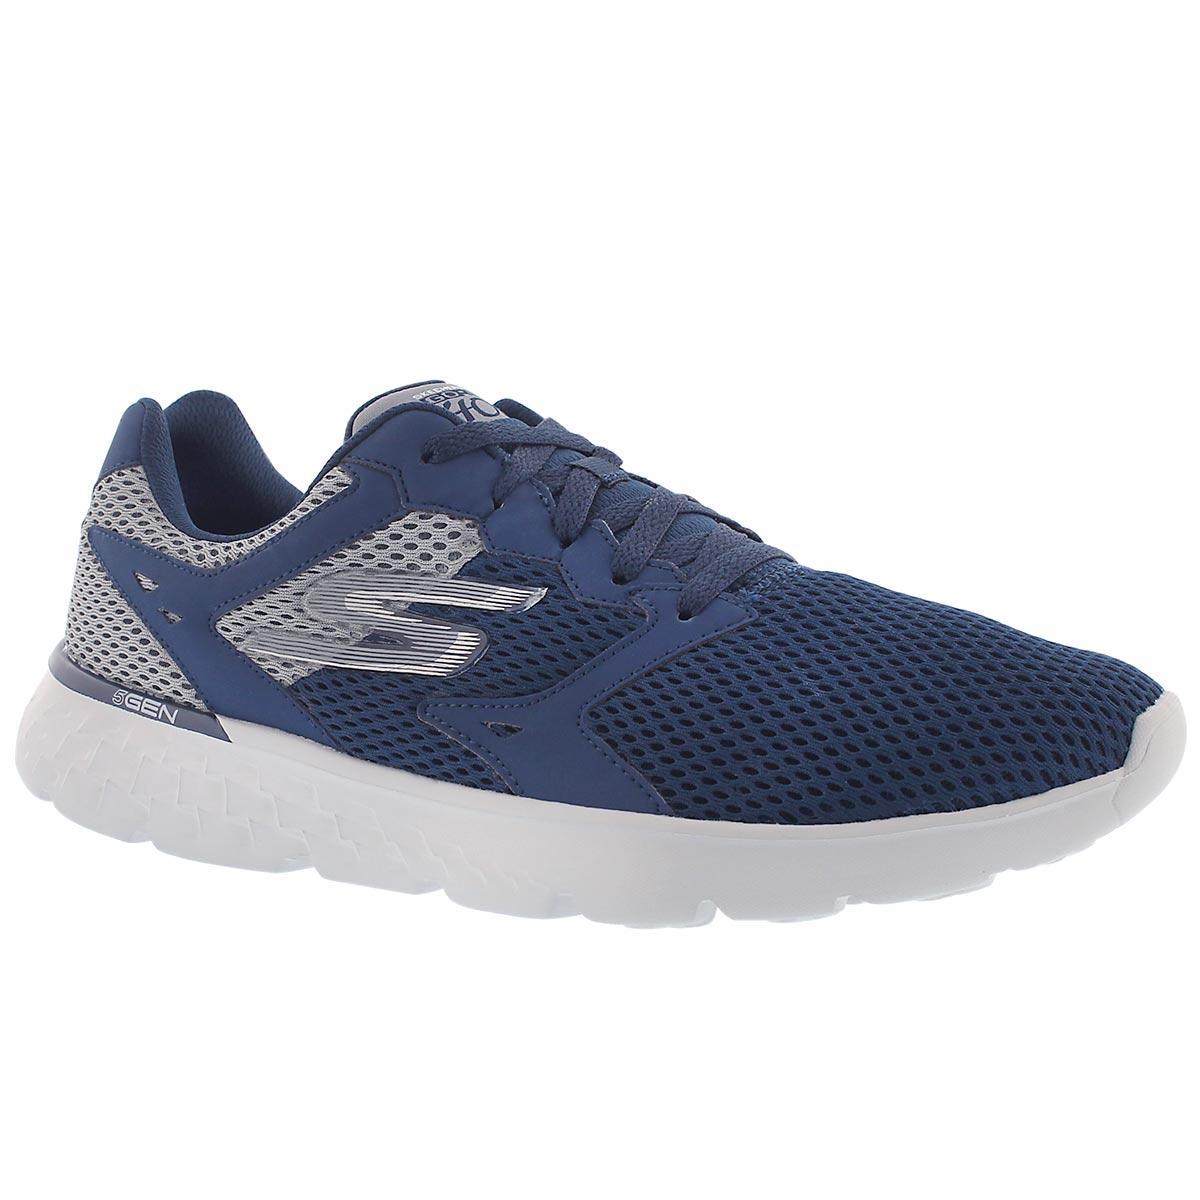 Mns GO Run 400 navy lace up running shoe